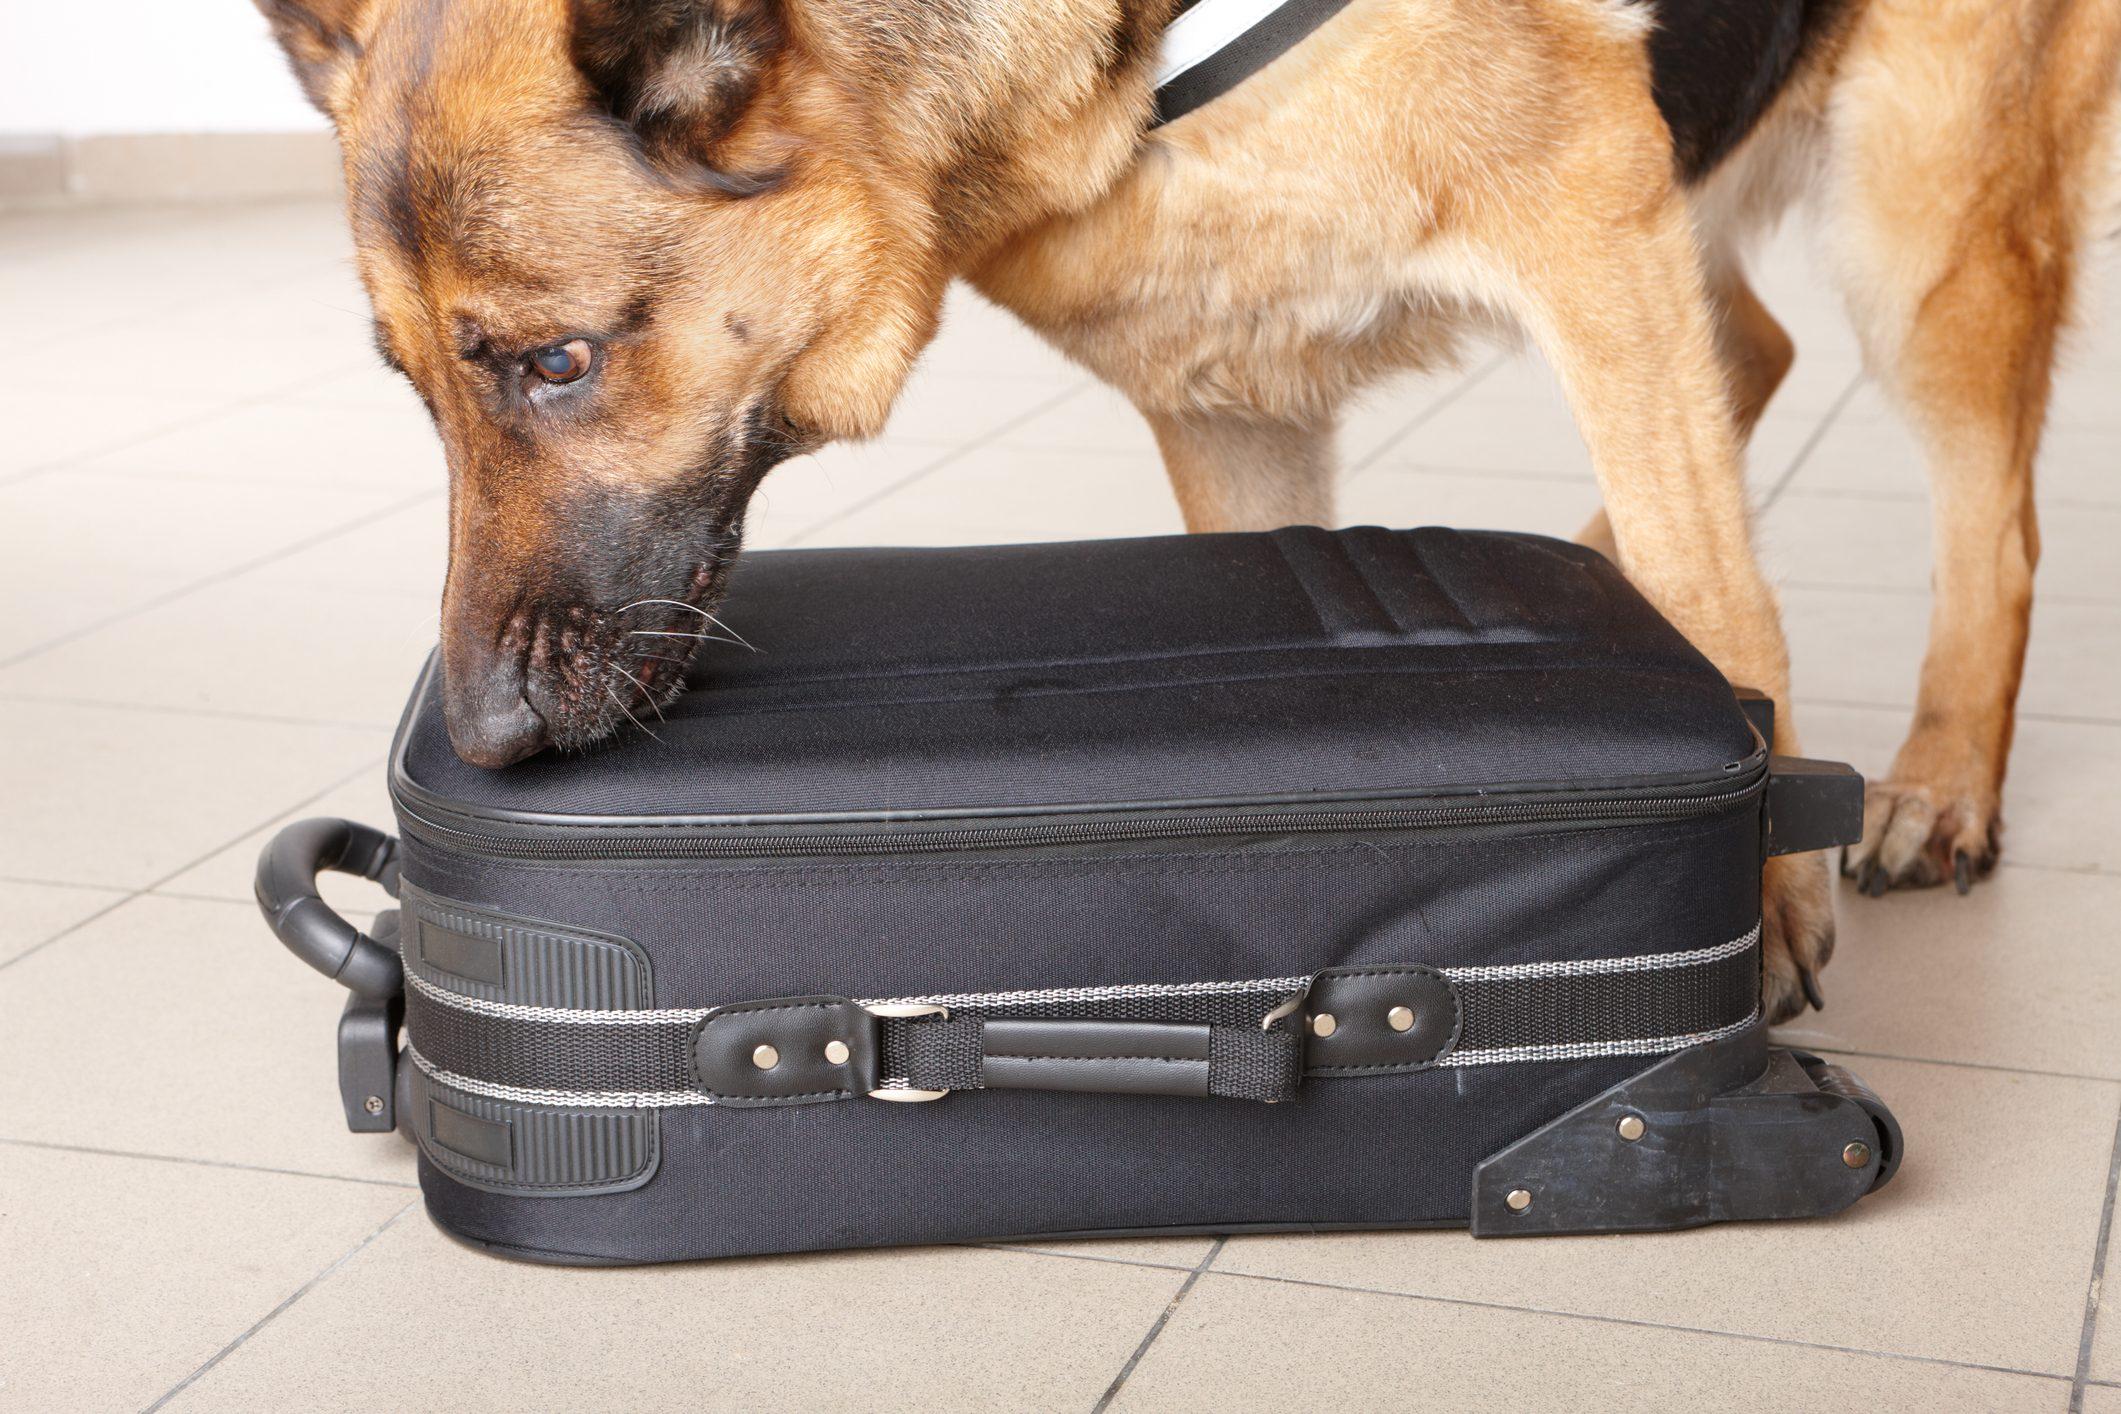 Police German Shepard dog sniffing luggage